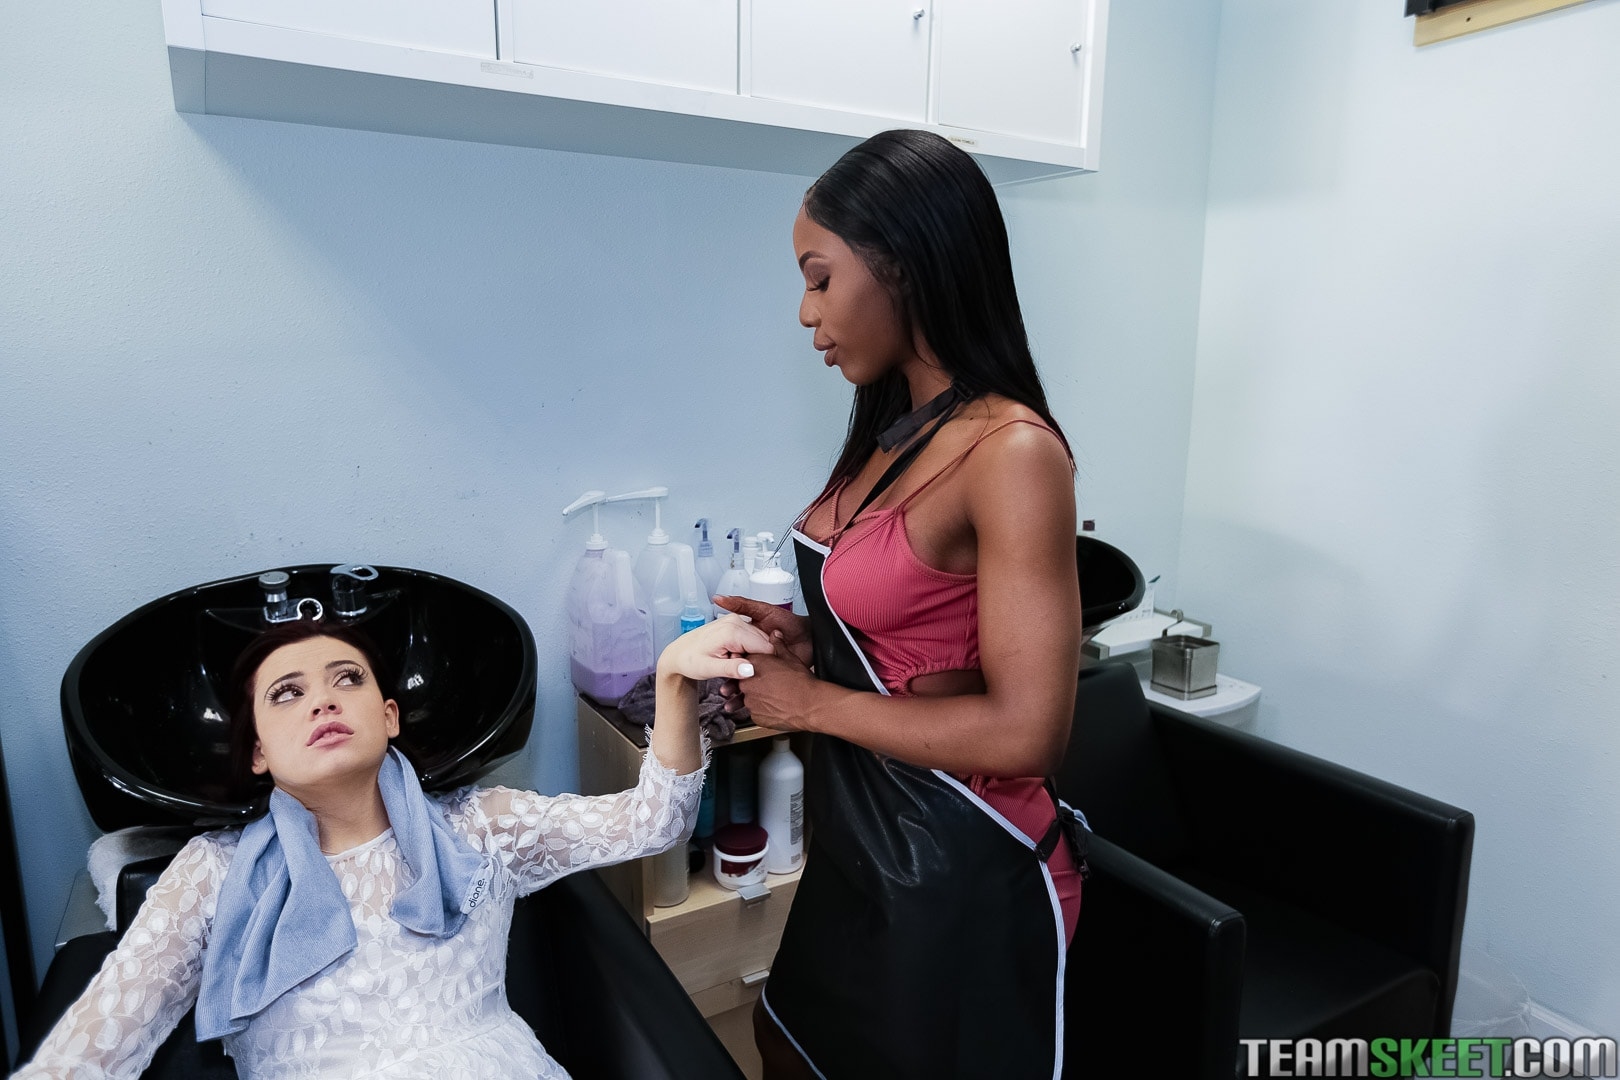 Team Skeet 'Full Service Hair Salon' starring Sabina Rouge (Photo 104)